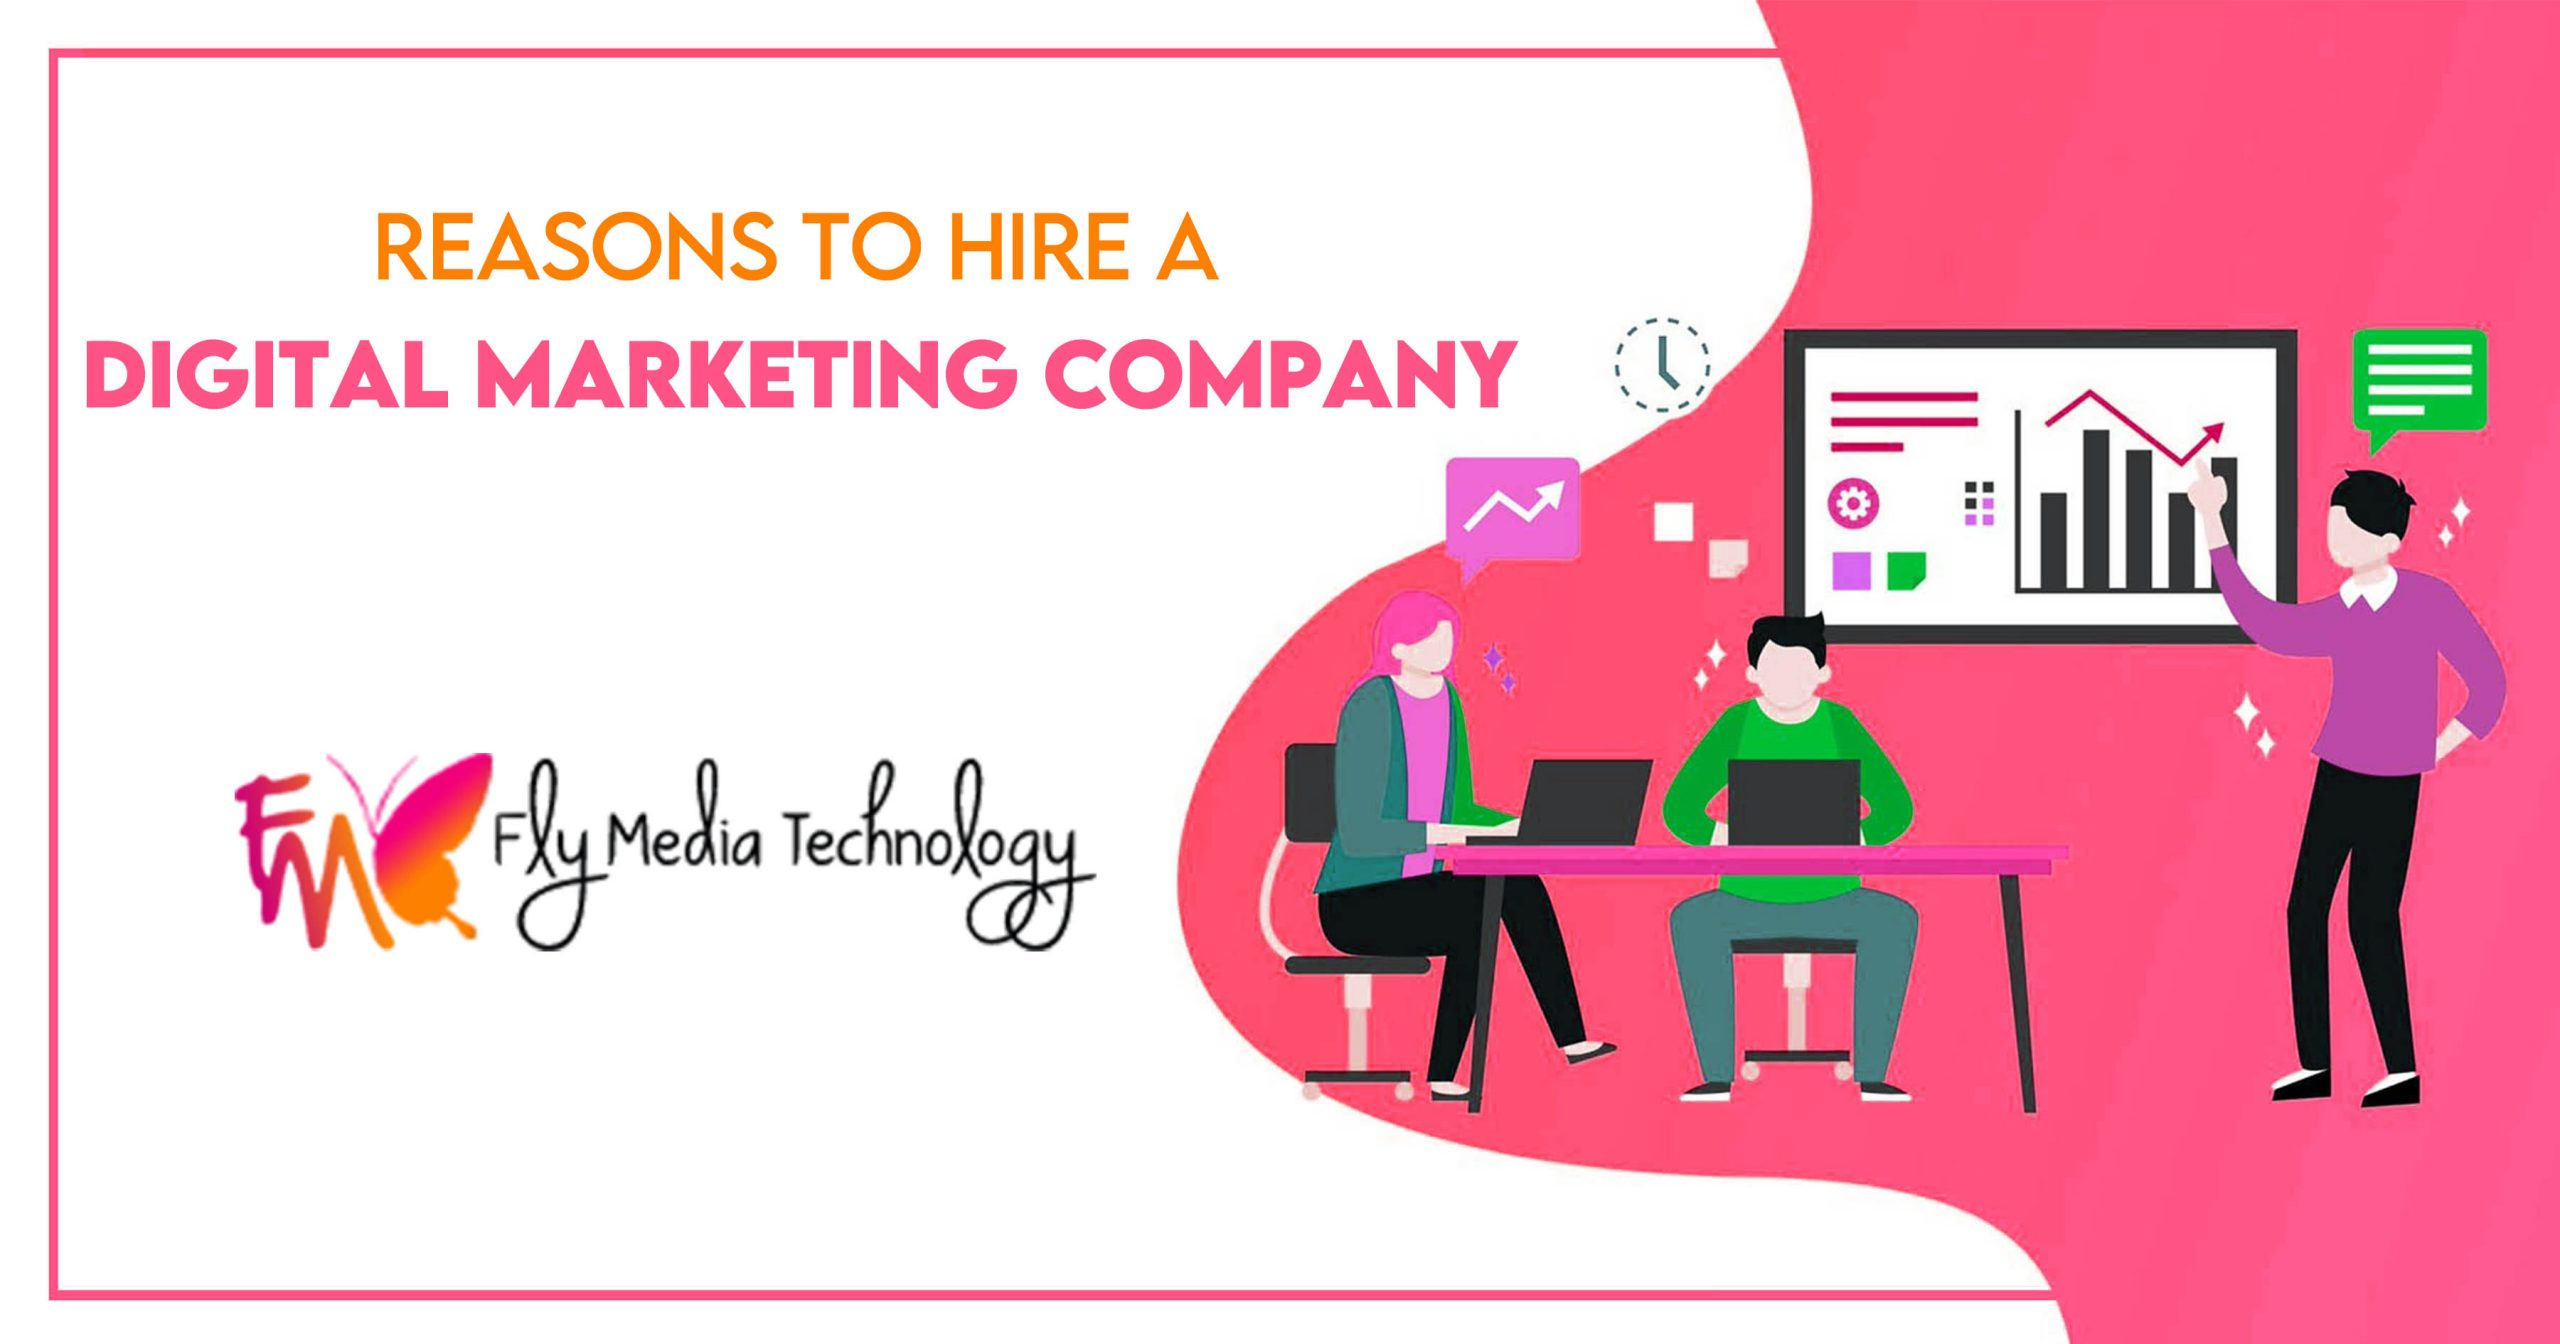 Reasons to hire a digital marketing company